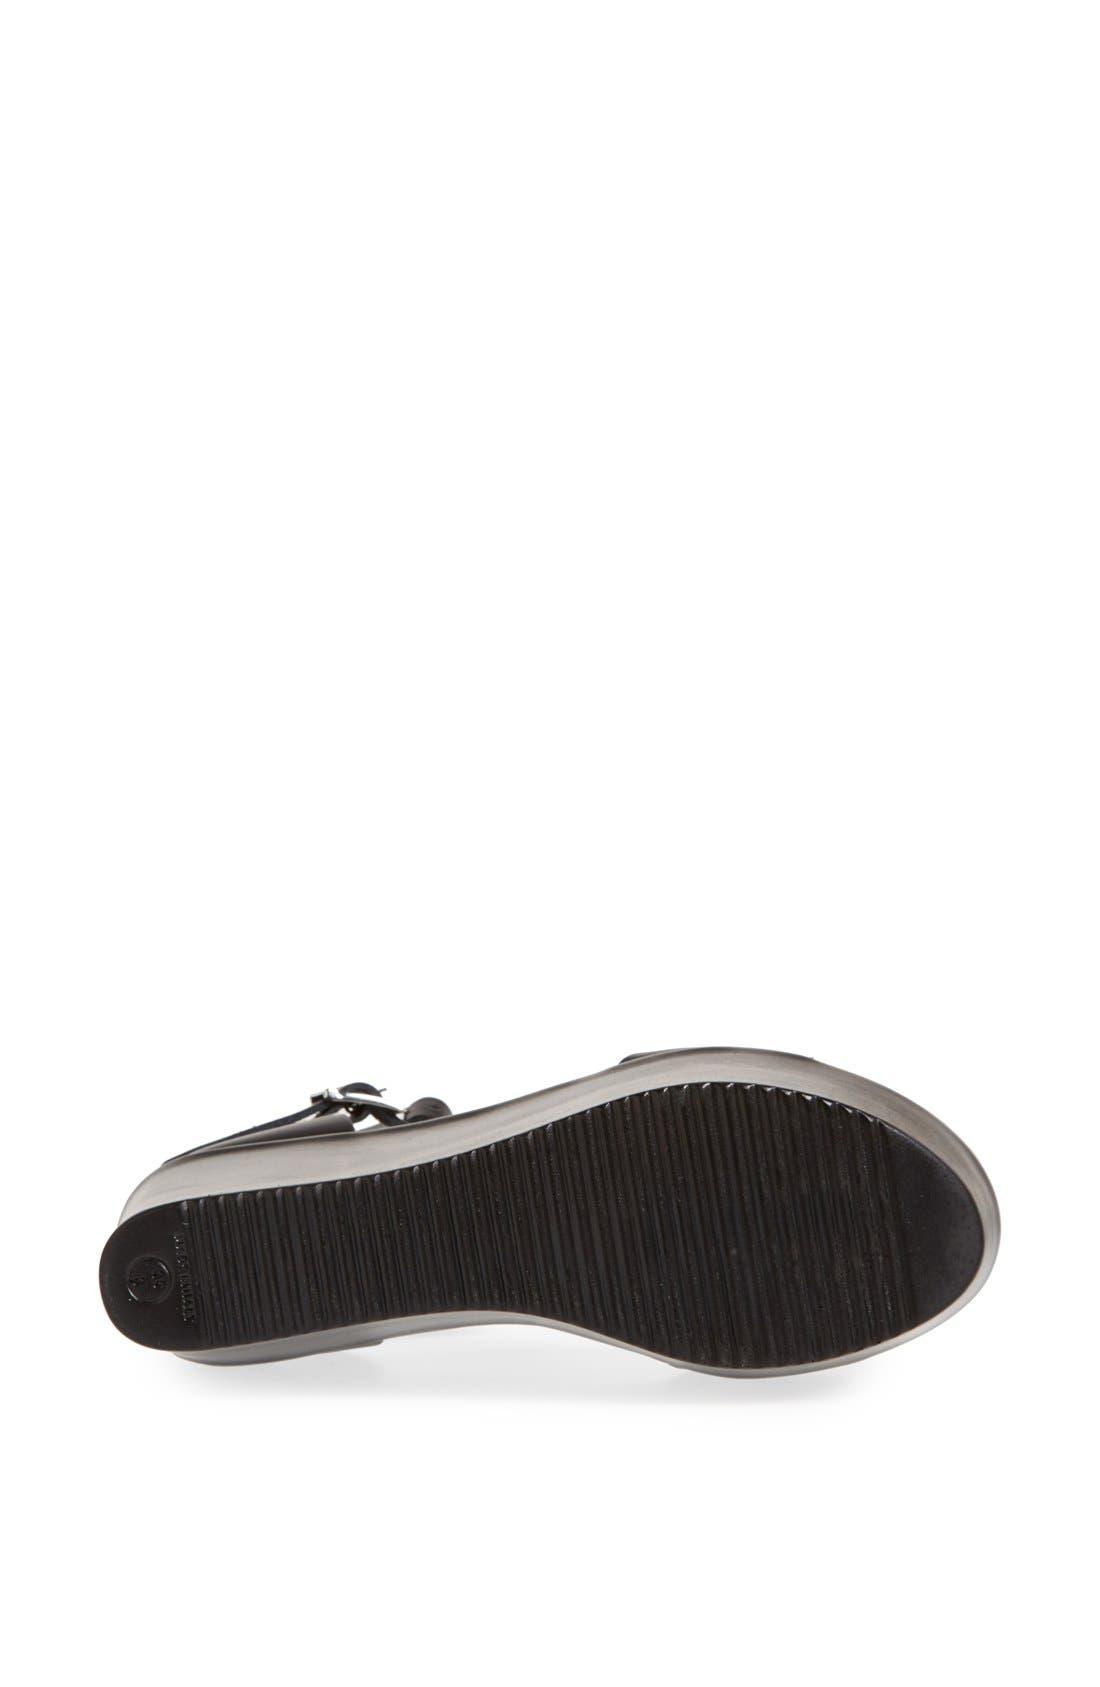 TOPSHOP, 'Wallis' Ankle Strap Platform Sandal, Alternate thumbnail 4, color, 001